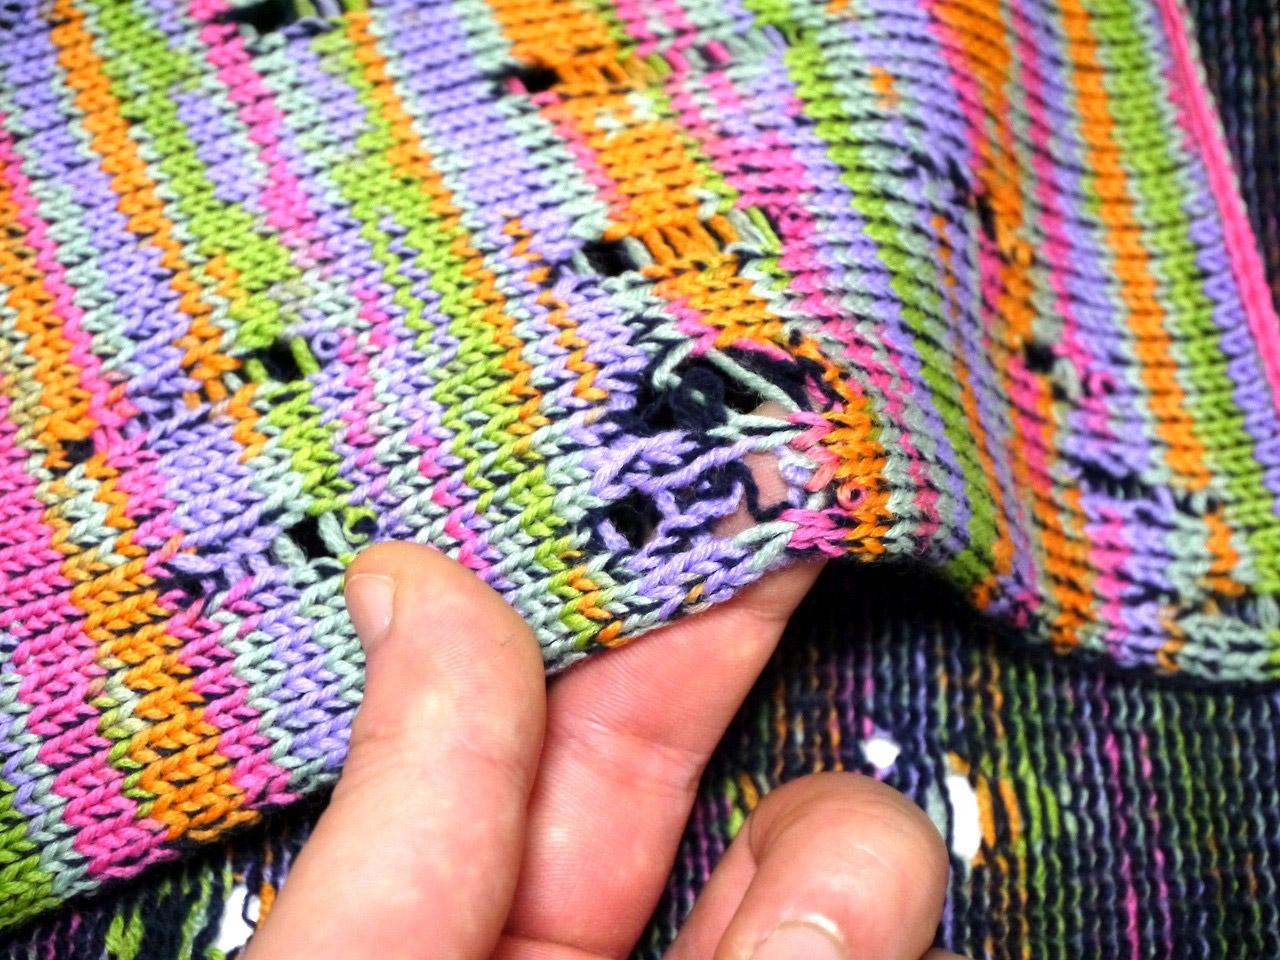 Glitch Knitting by Nukeme (Artist, Tokyo)